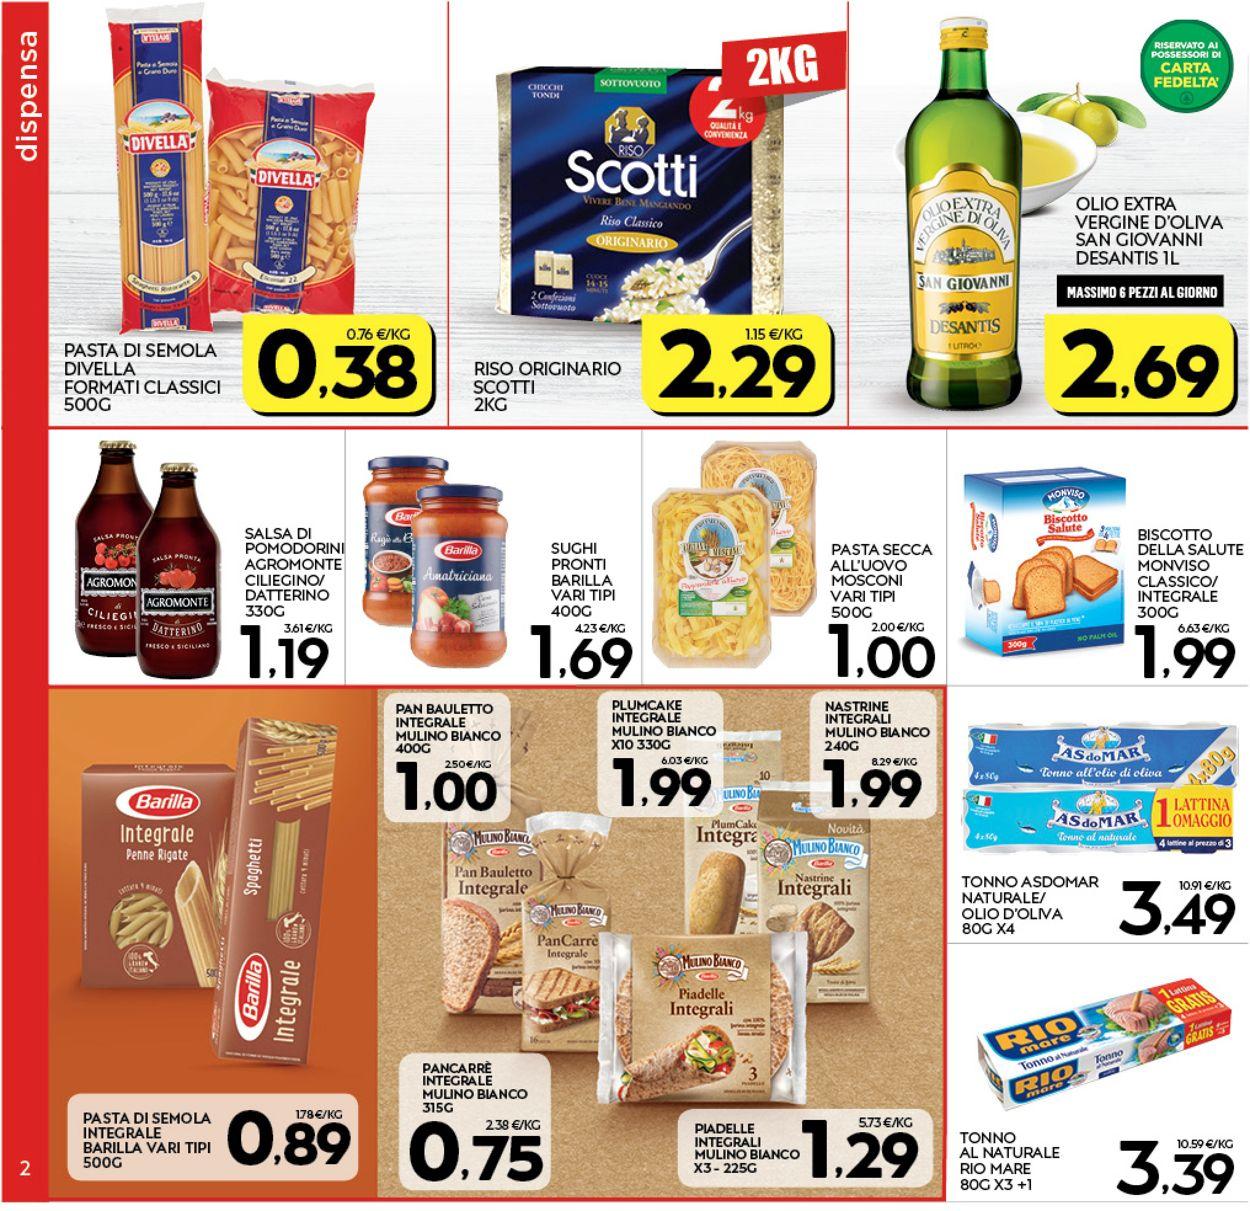 Volantino Interspar - Offerte 16/07-26/07/2020 (Pagina 2)